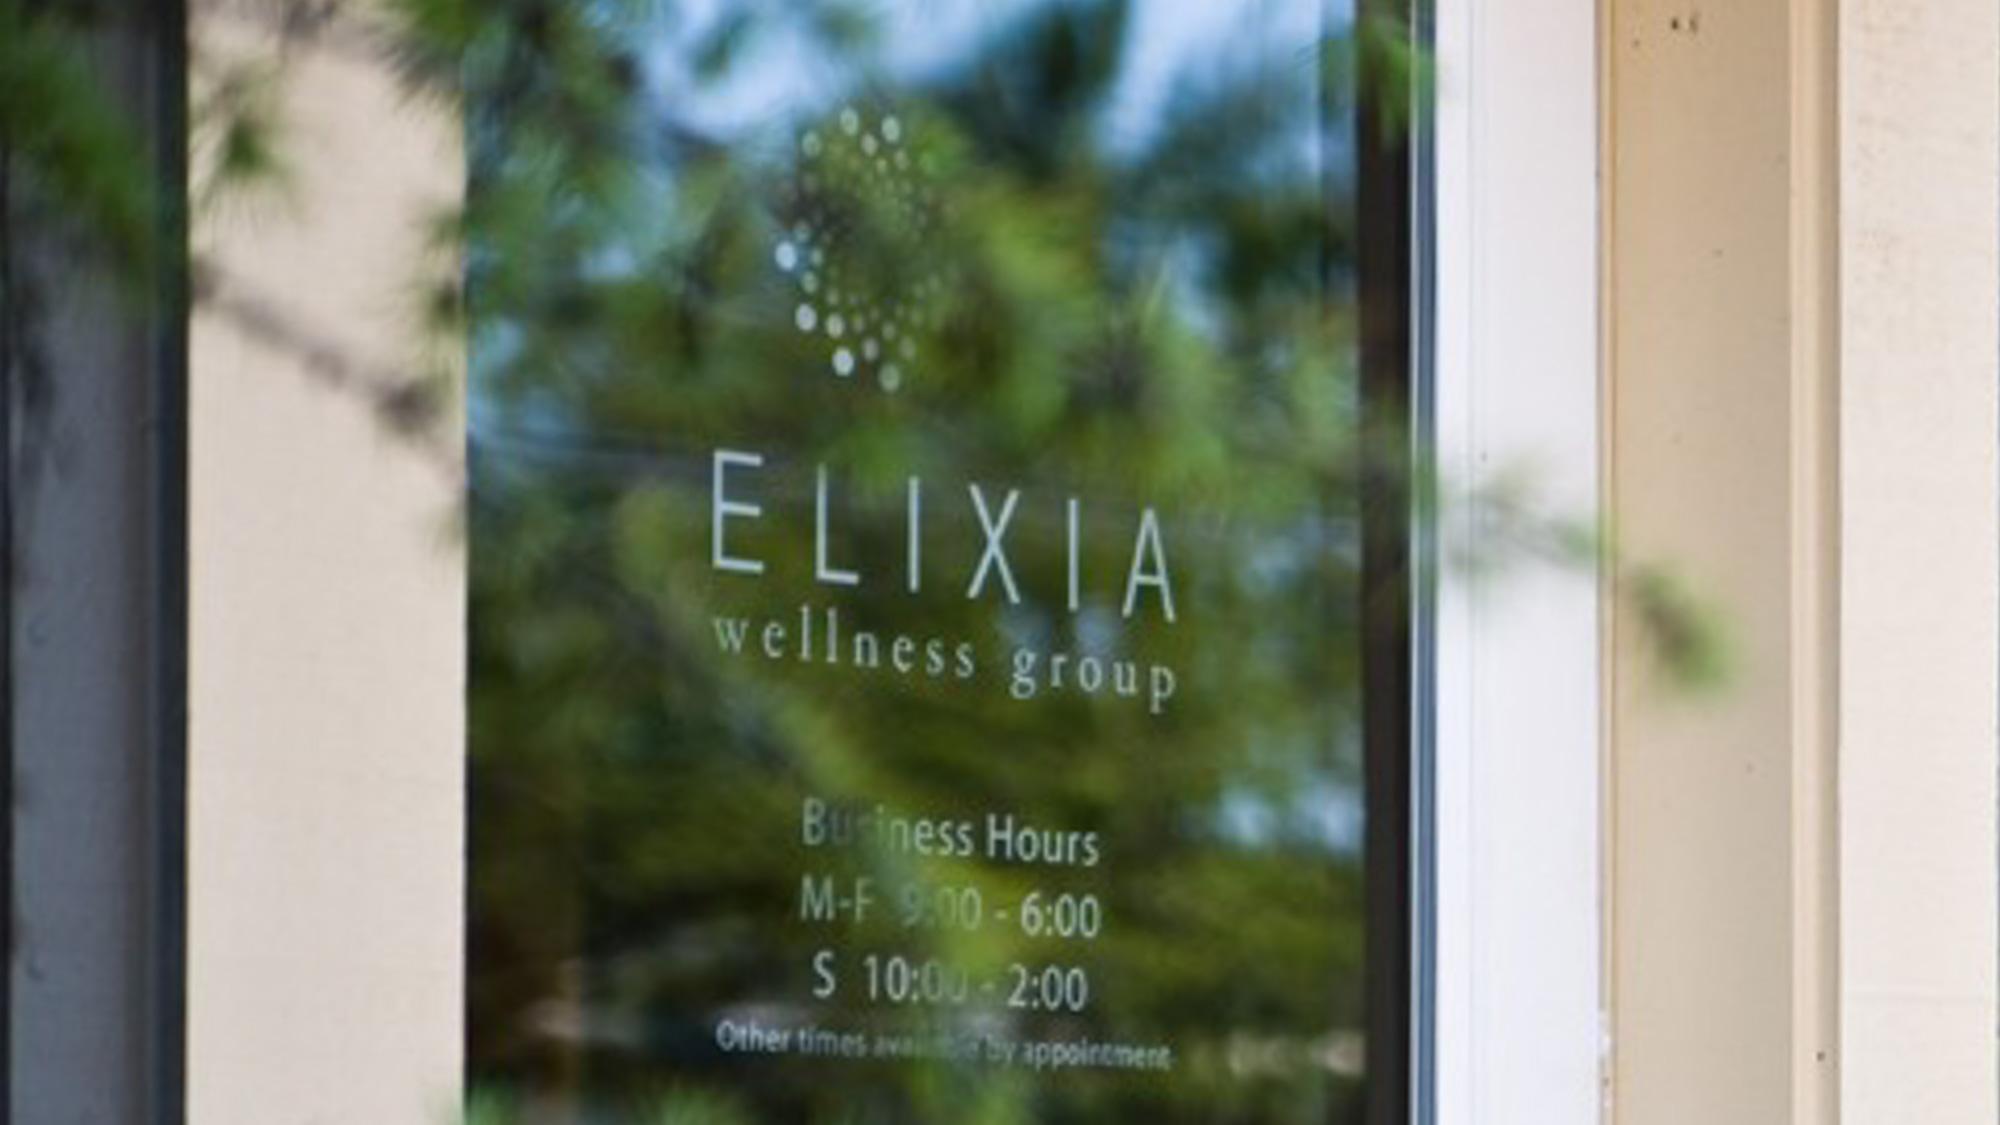 visit-sellwood-moreland-business-alliance_elixia-2.jpg